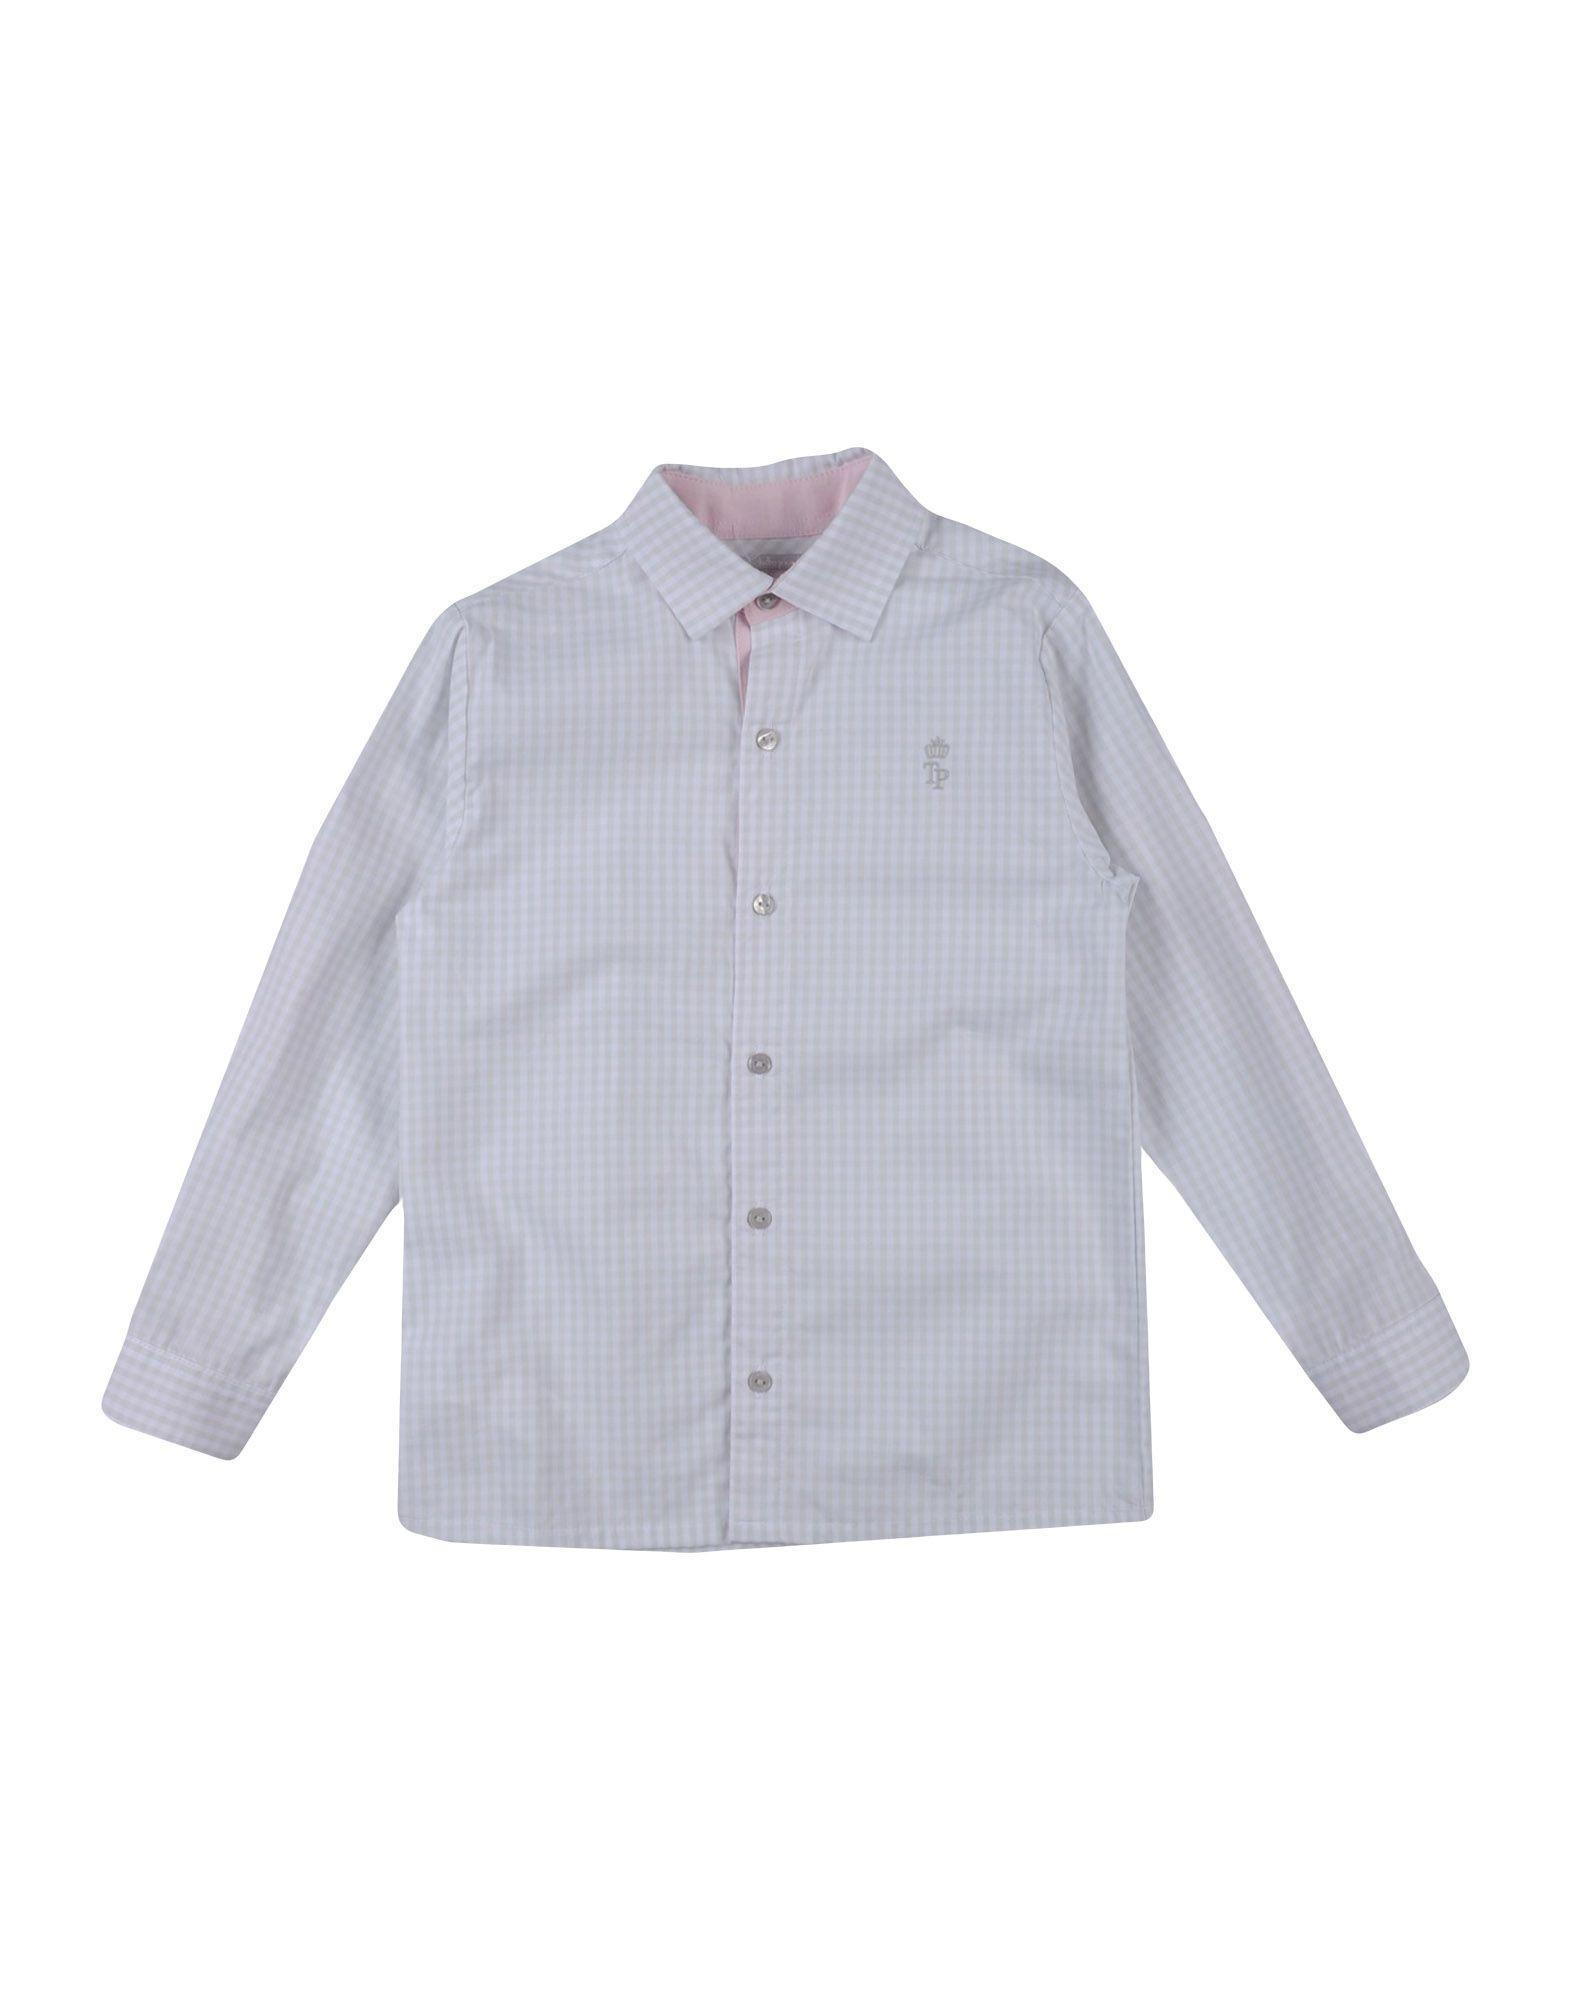 TUTTO PICCOLO Pубашка цены онлайн